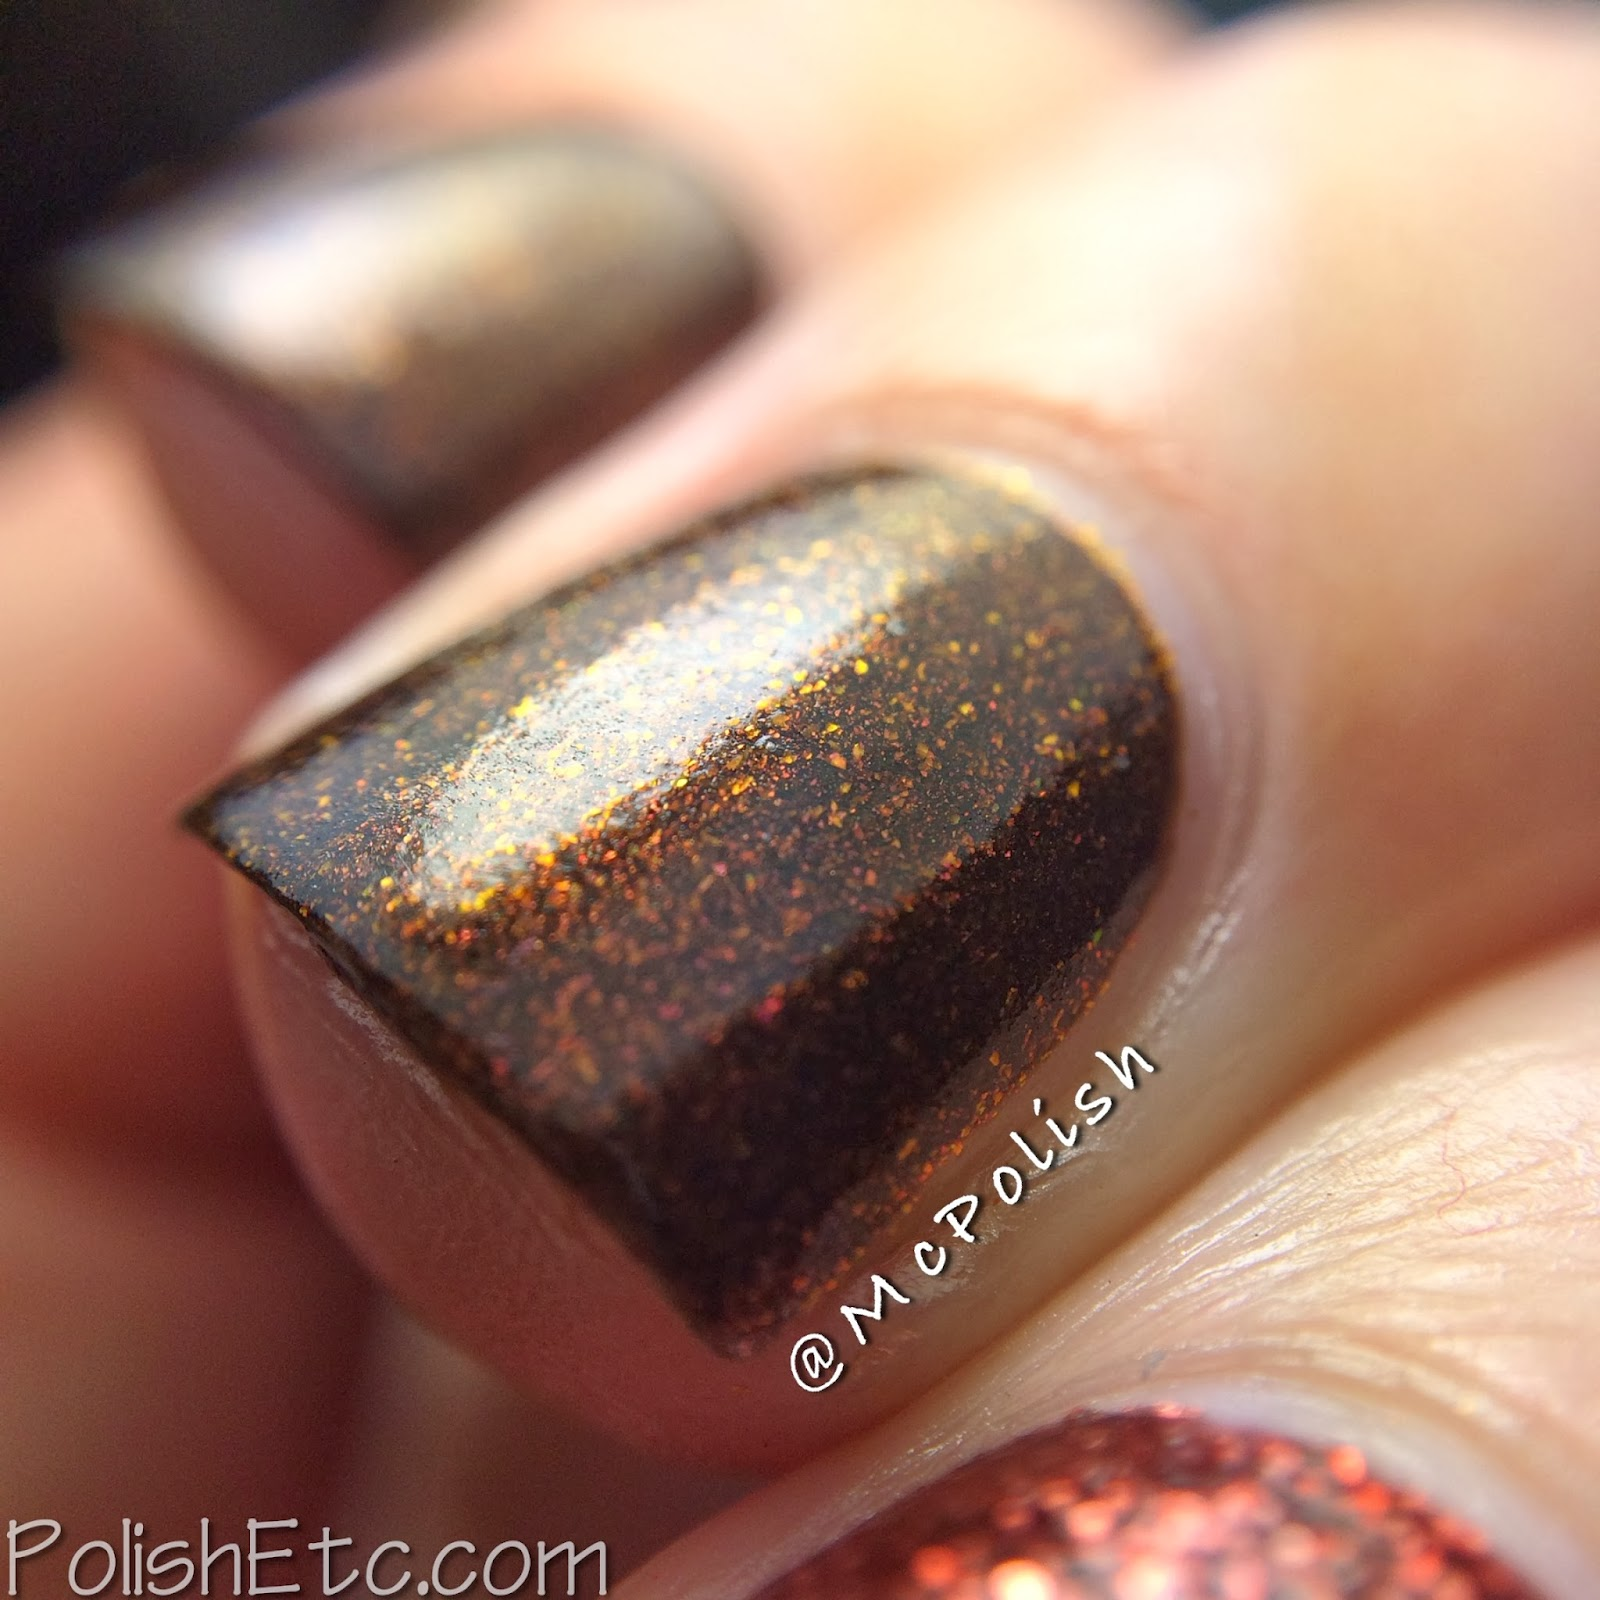 Revlon Parfumerie scented nail polish in Autumn Spice, macro